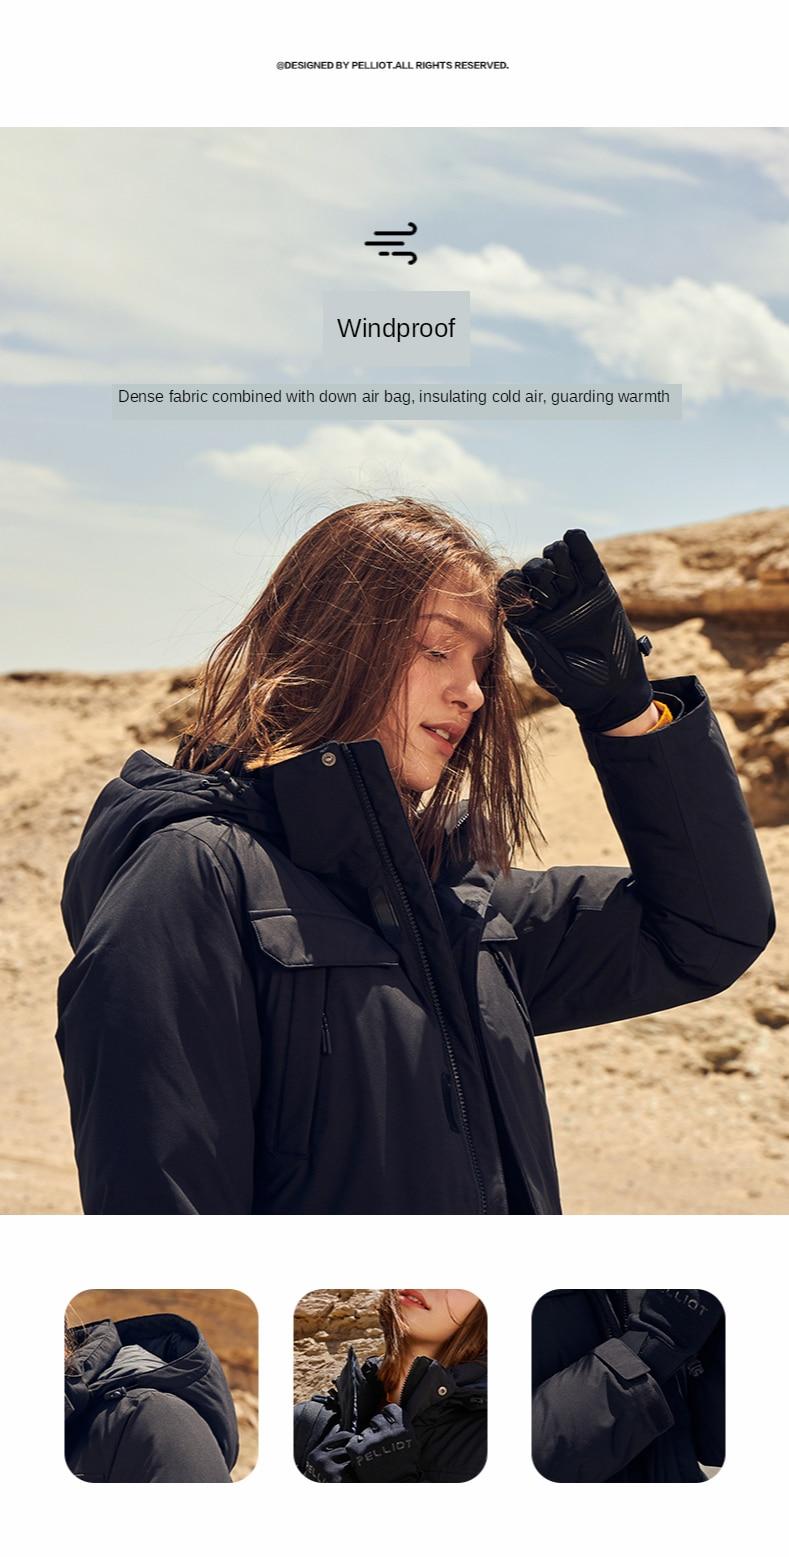 Pelliot acampamento turismo jaqueta feminina jaquetas de